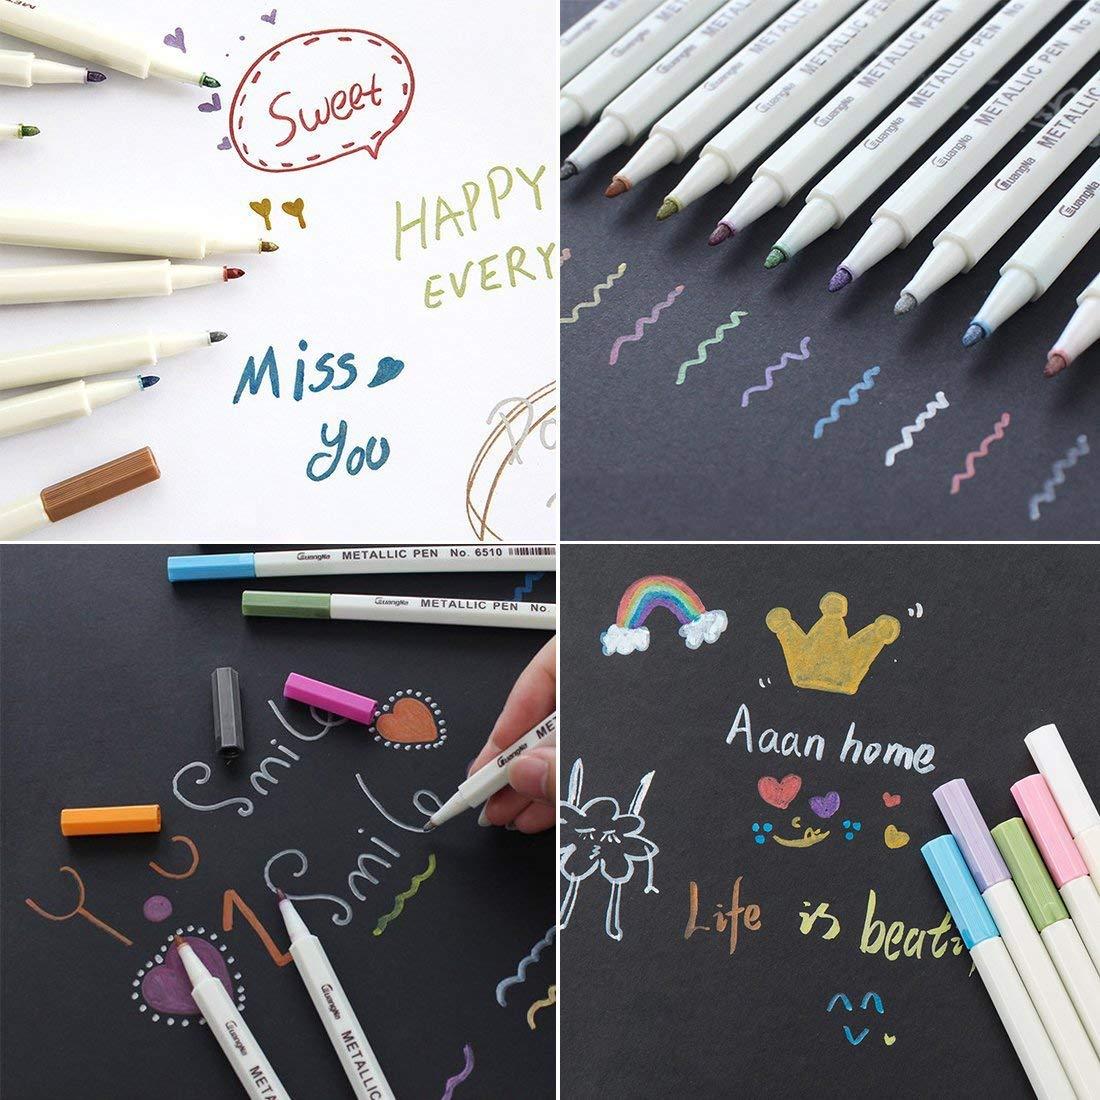 15 Colors Metallic Marker Pen Art Marker Soft Brush Pen For DIY Scrapbooking Crafts Black Paper Stationery School Supplies